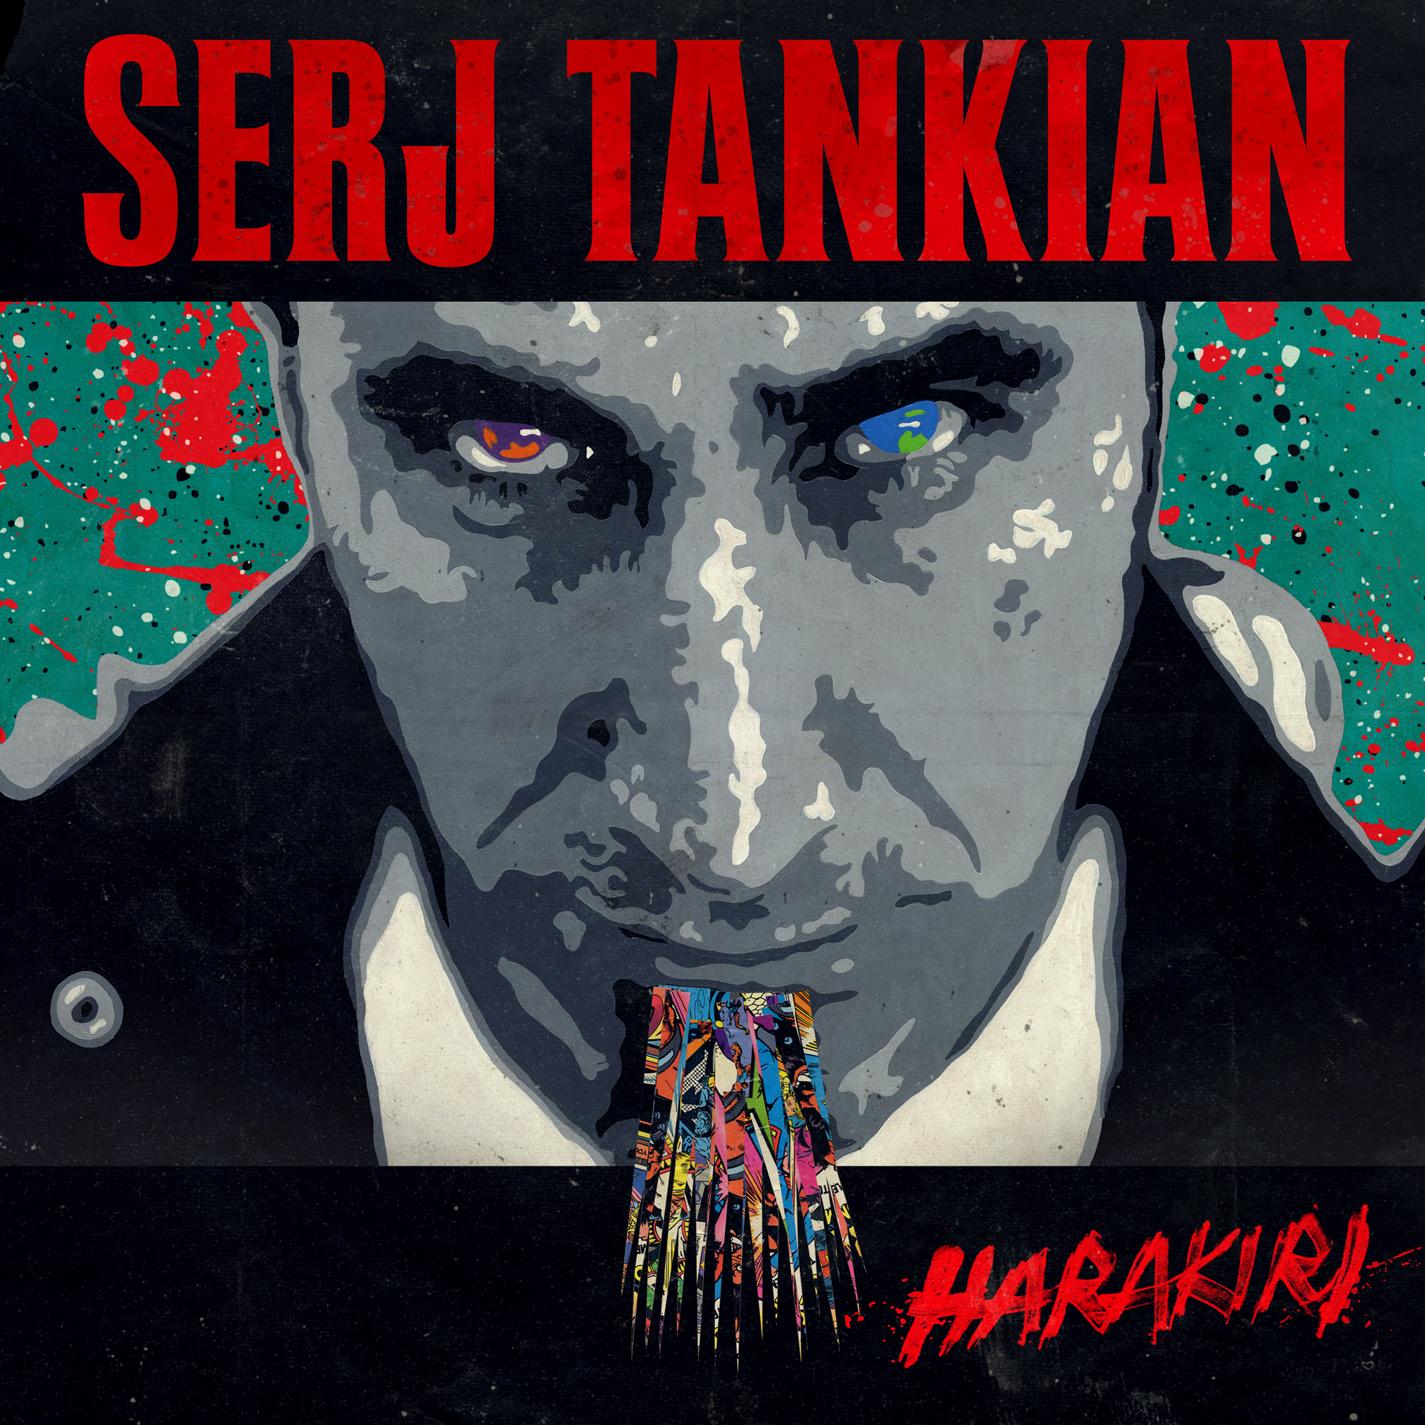 Serj Tankian - Harakiri - MP3 Download